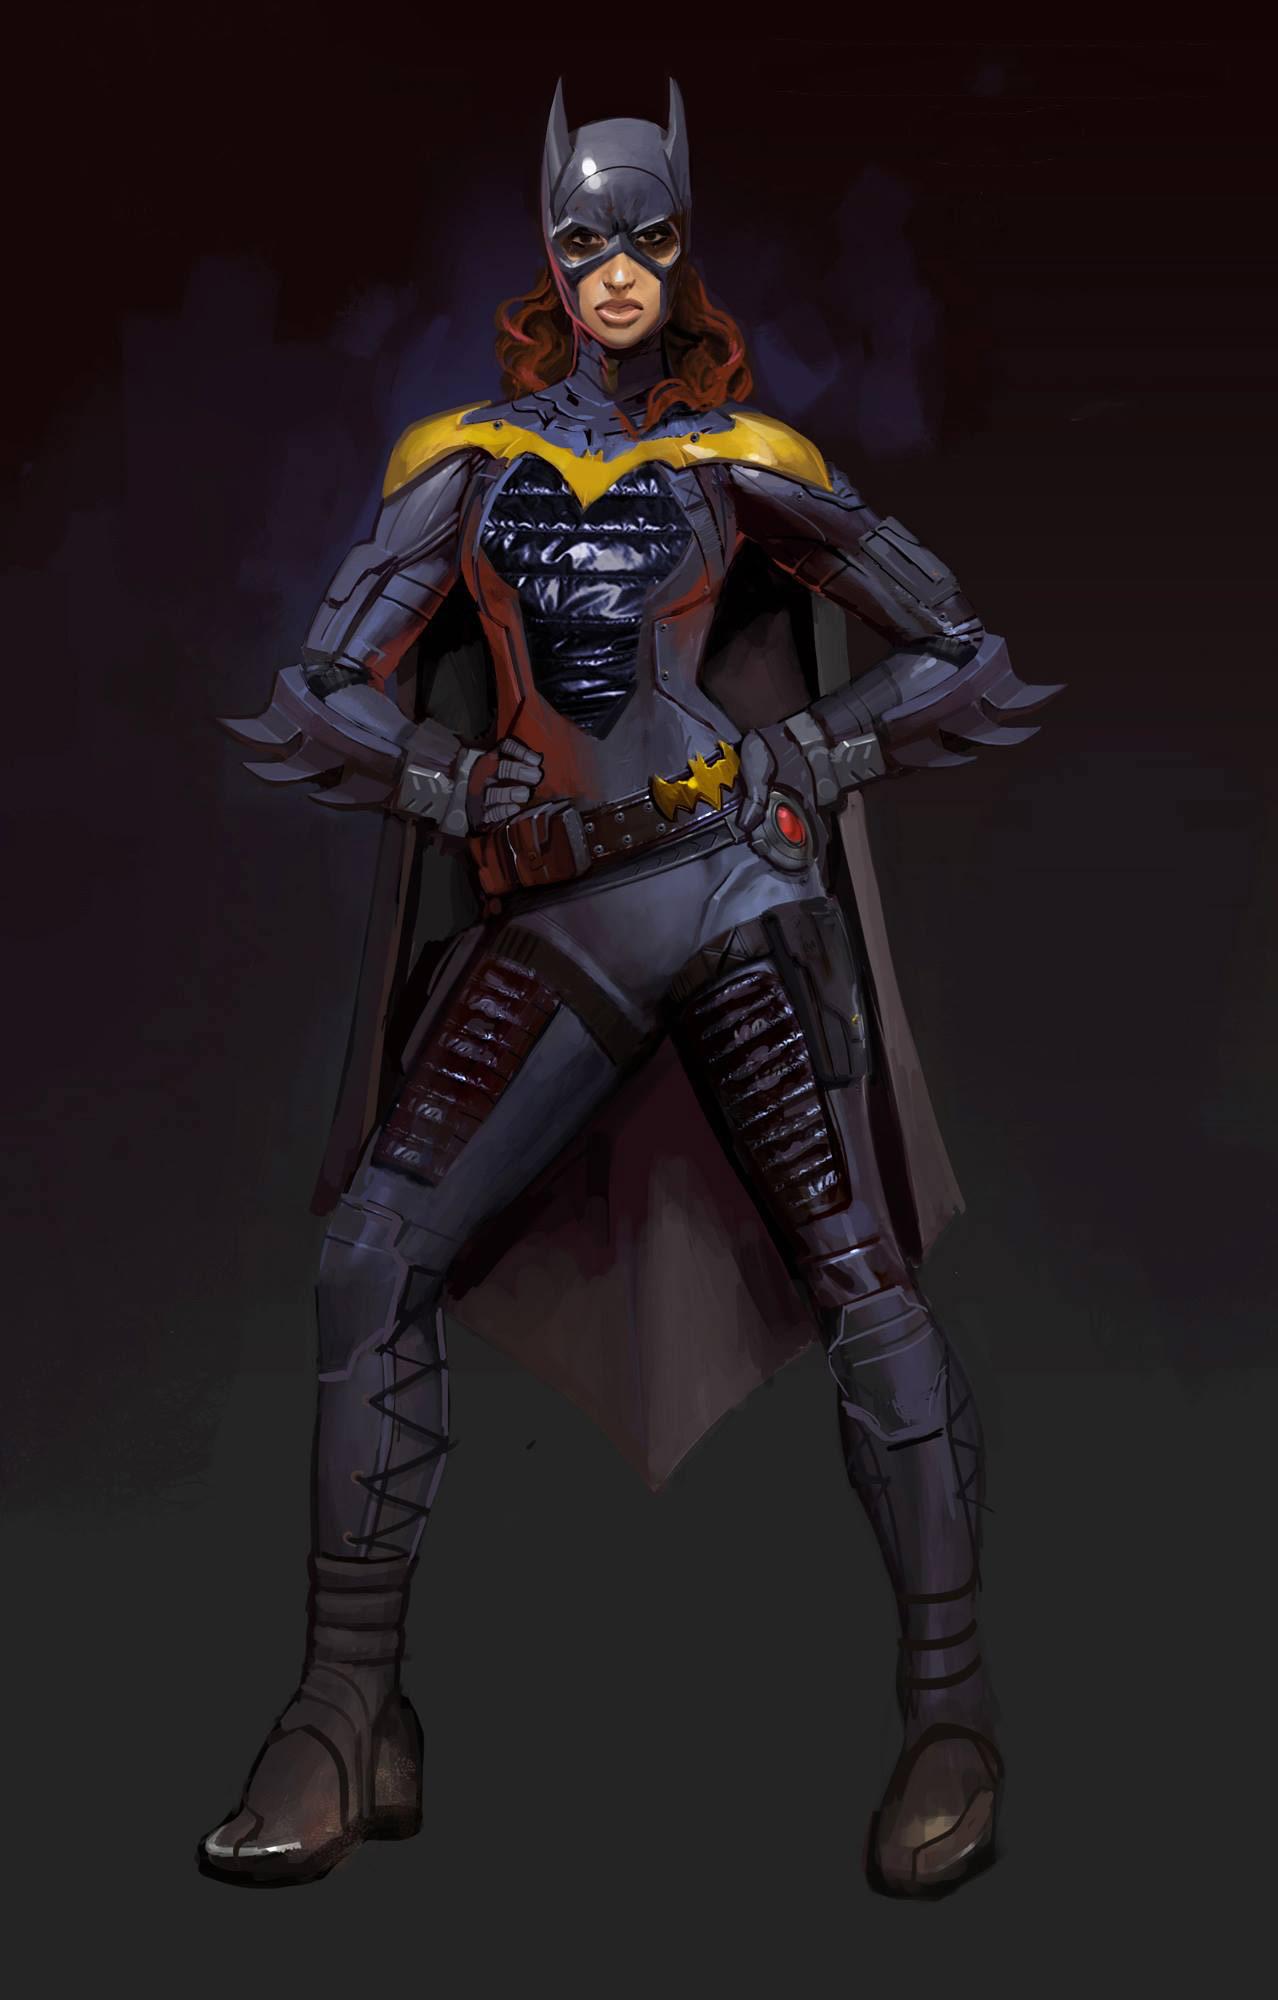 Batgirl (Injustice: Gods Among Us)